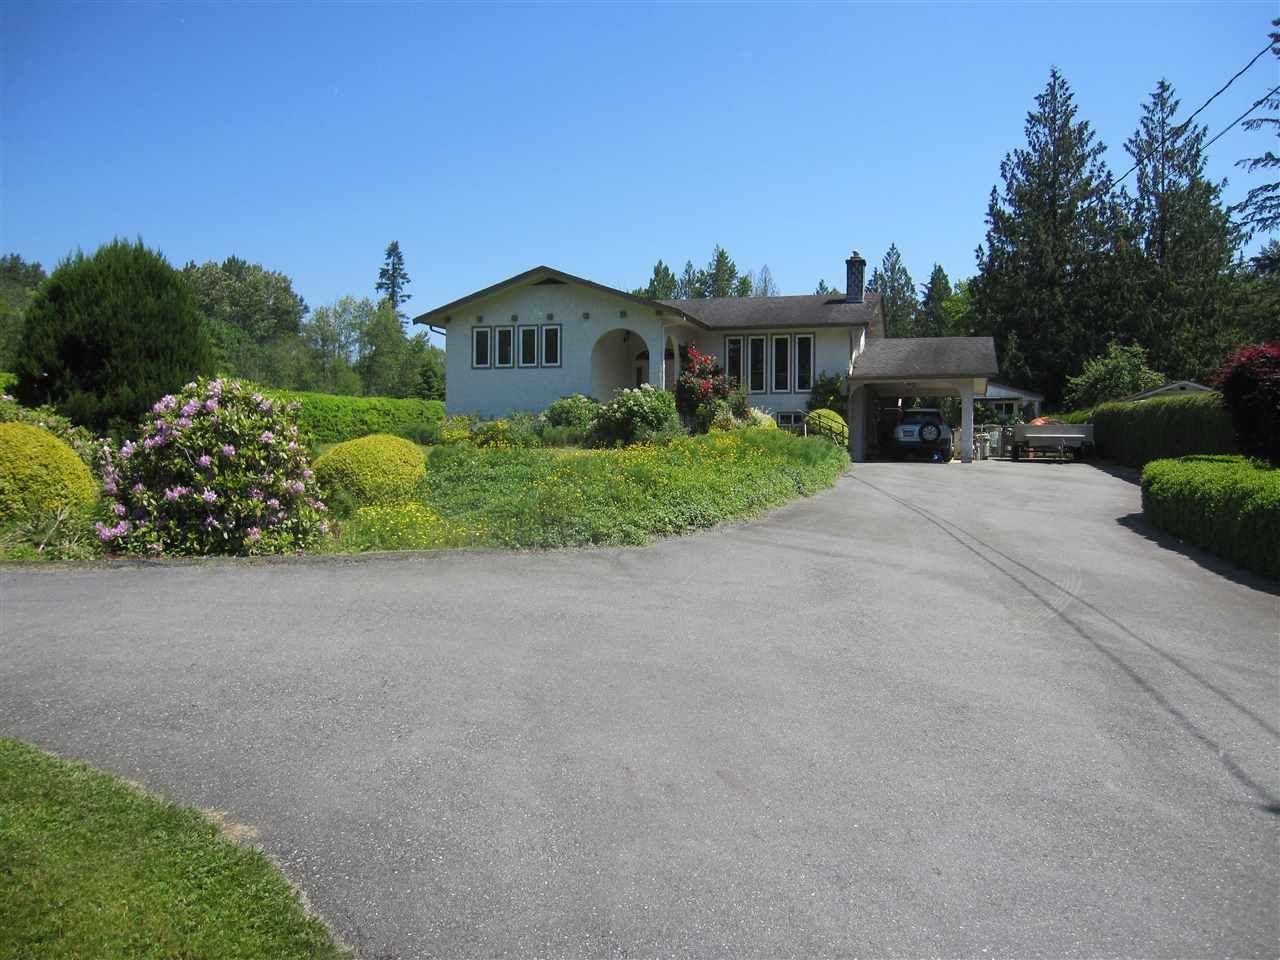 Main Photo: 11744 246 Street in Maple Ridge: Cottonwood MR House for sale : MLS®# R2374206